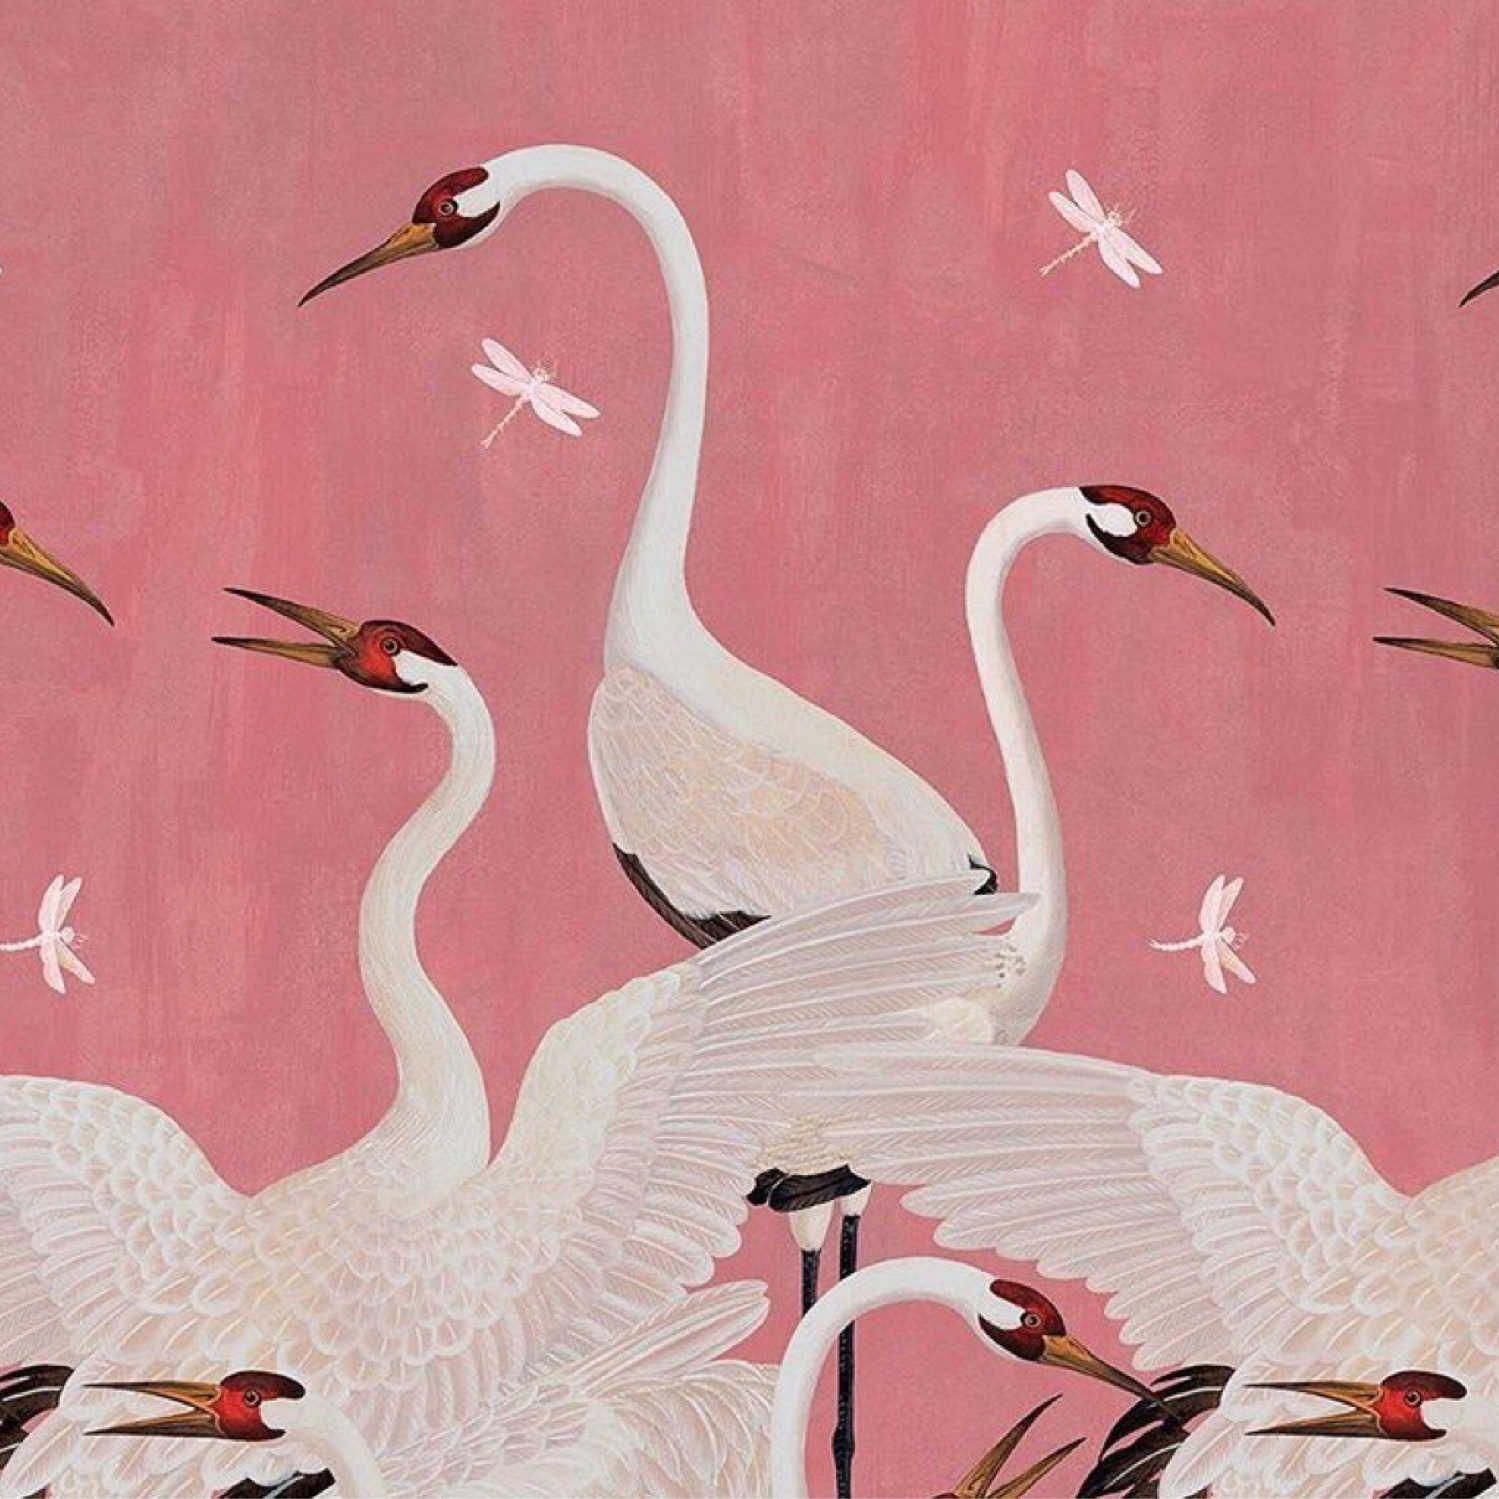 """gucci wallpaper bird""的图片搜索结果 Ilustrator, Bangau, dan"